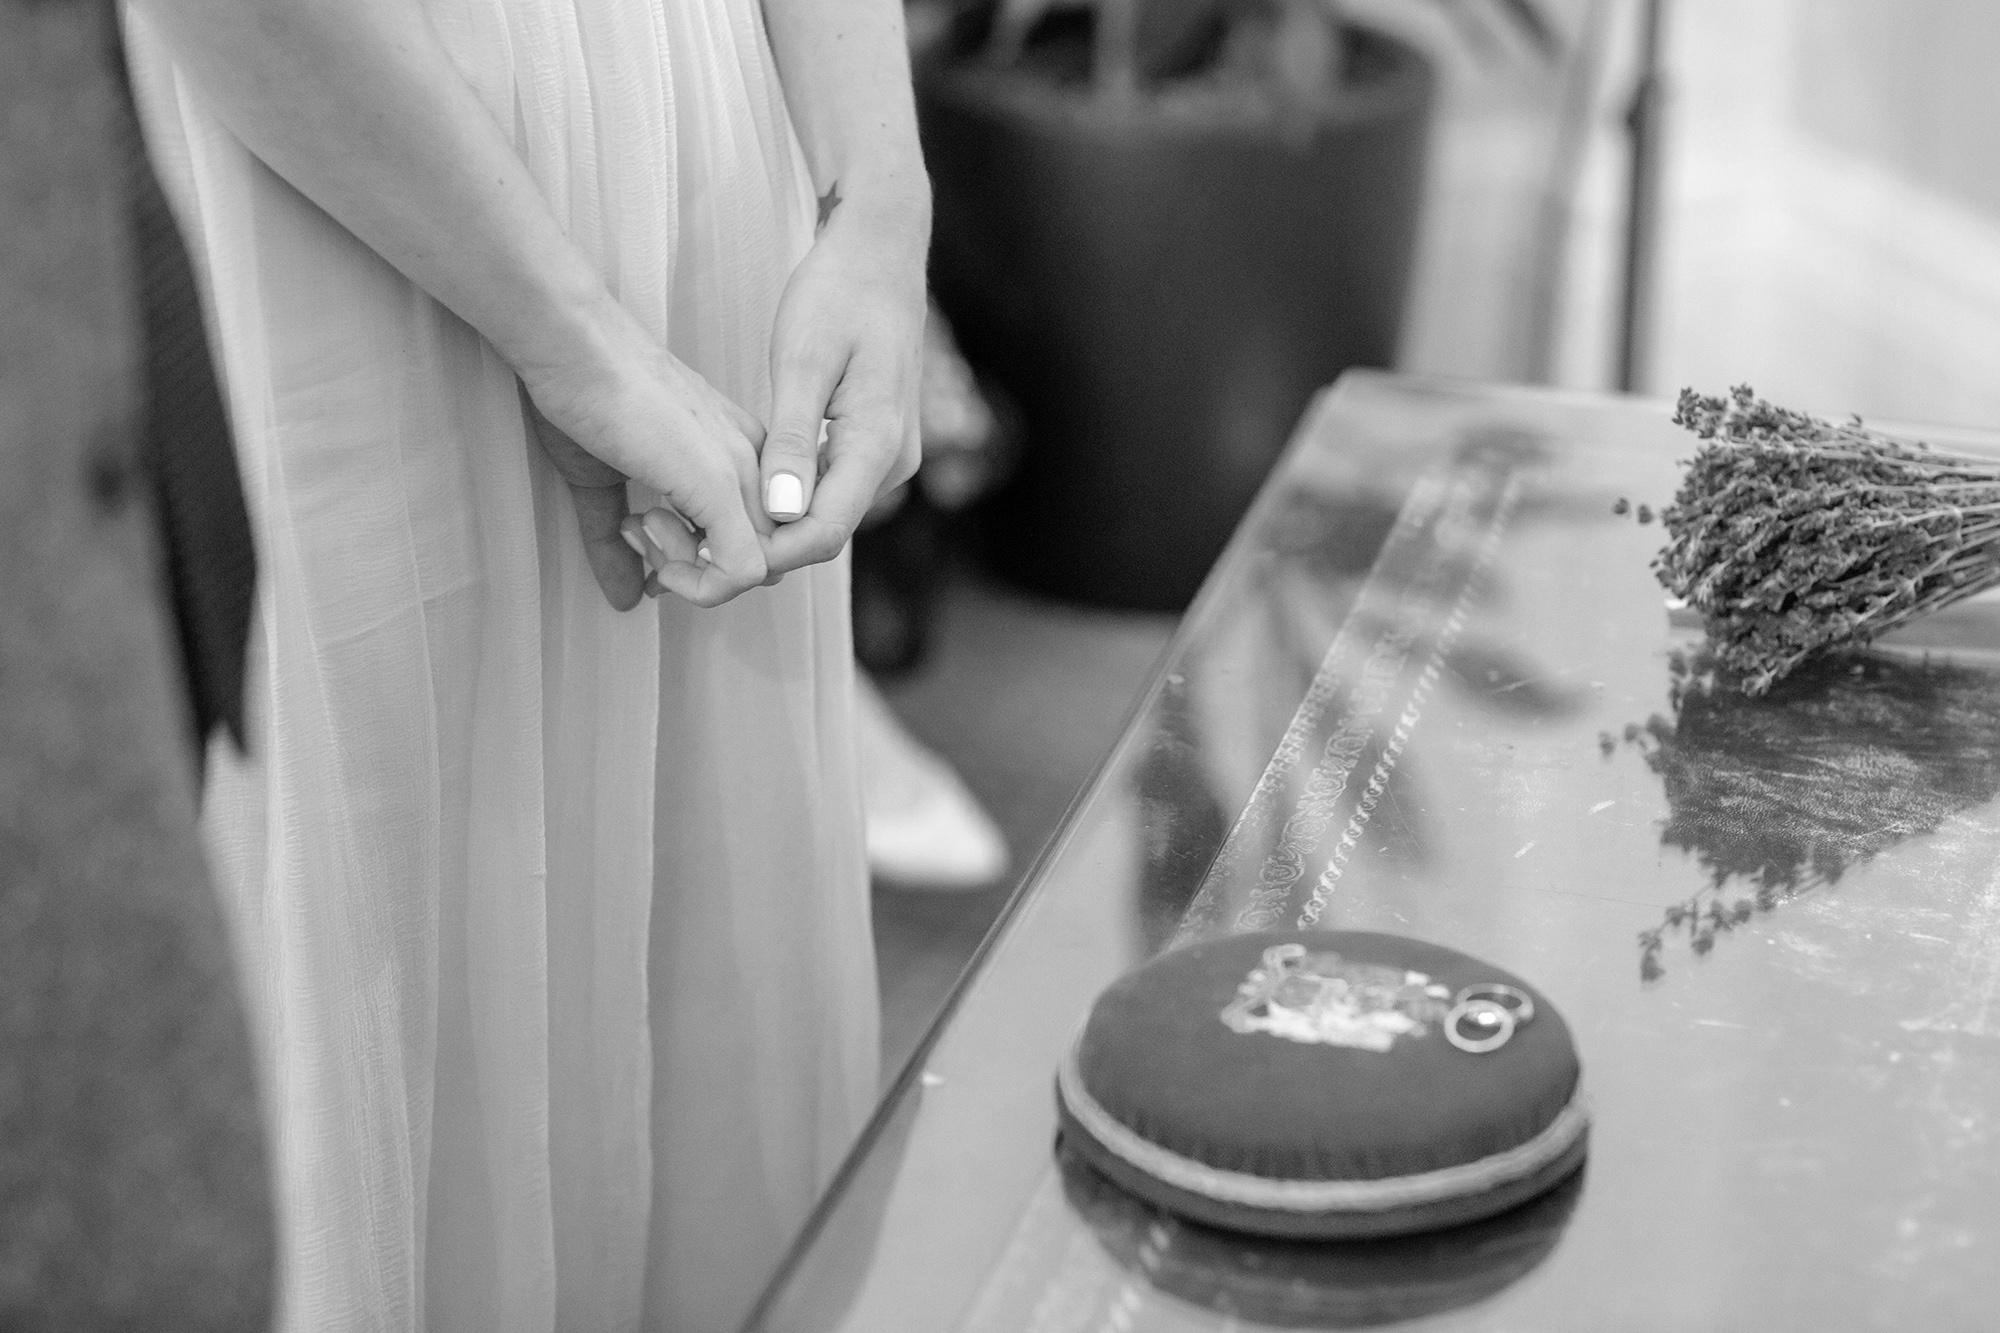 chichester_wedding_photographer_london_juliatoms_004.jpg